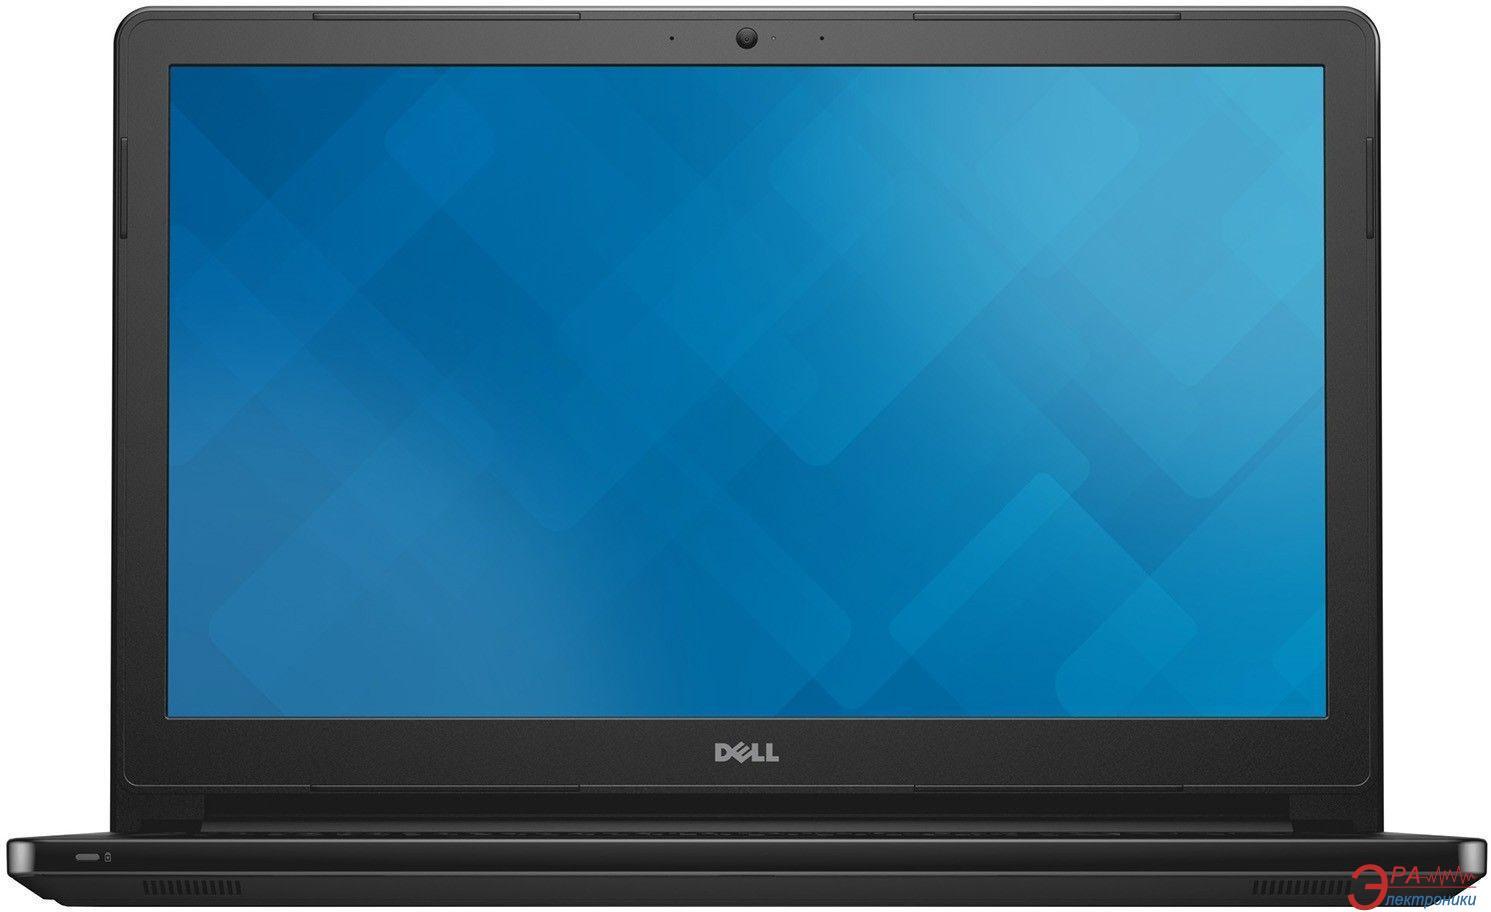 Ноутбук Dell Vostro 3559 (VAN15SKL1701_008_UBU) Black 15,6